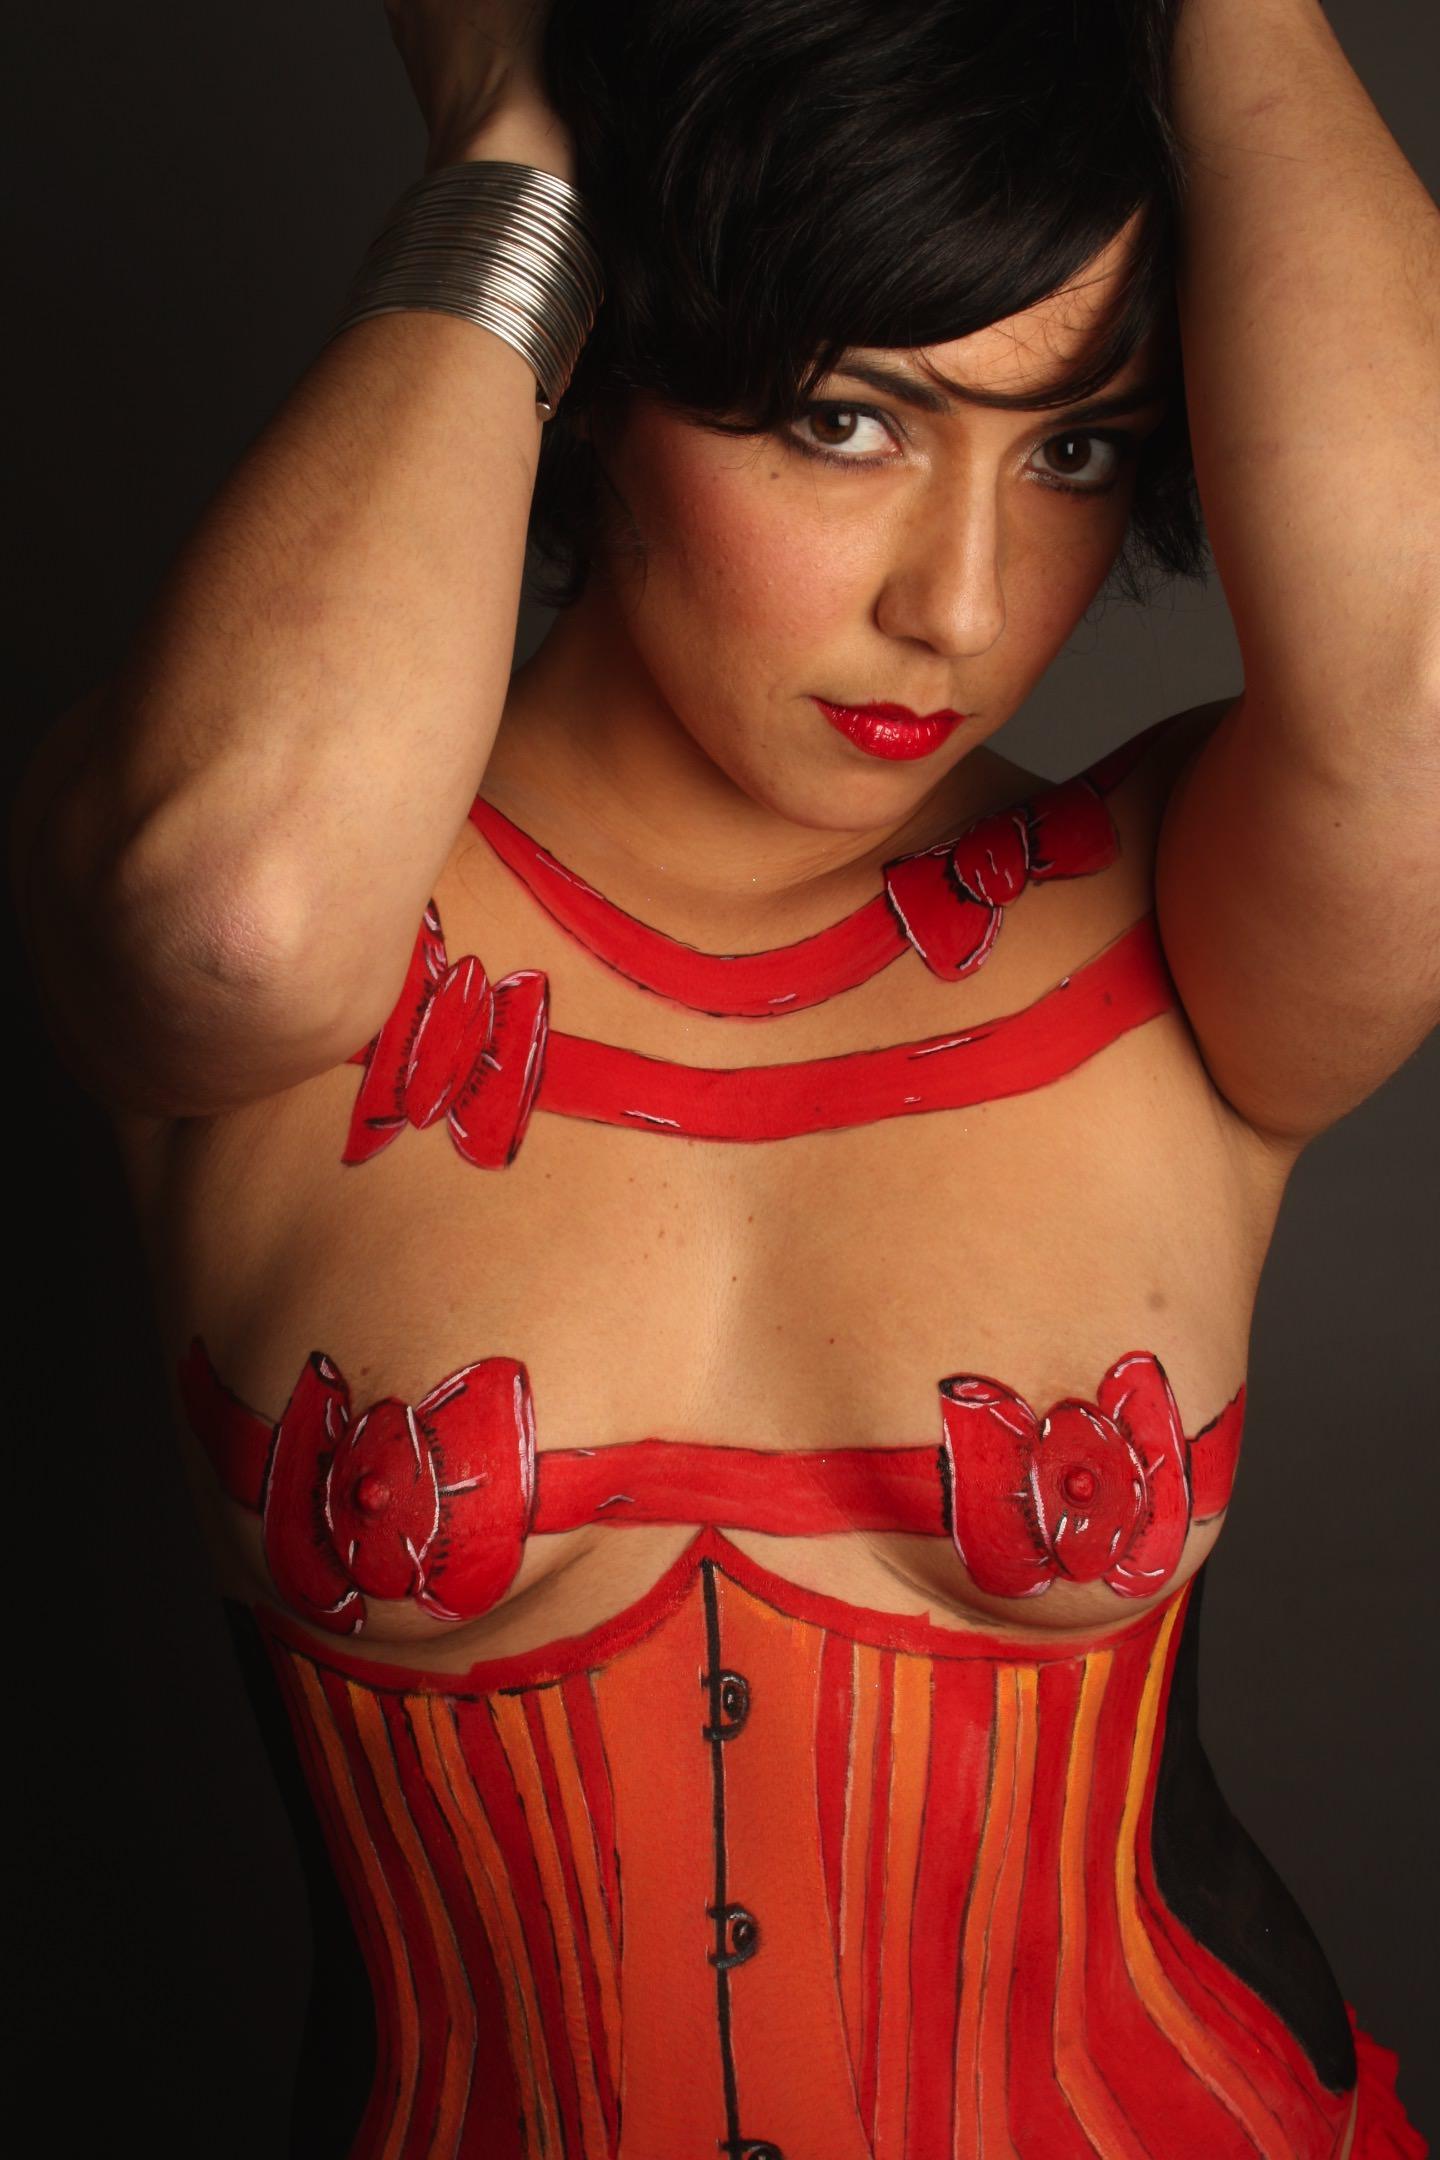 Modèle : Natalia Jorquera